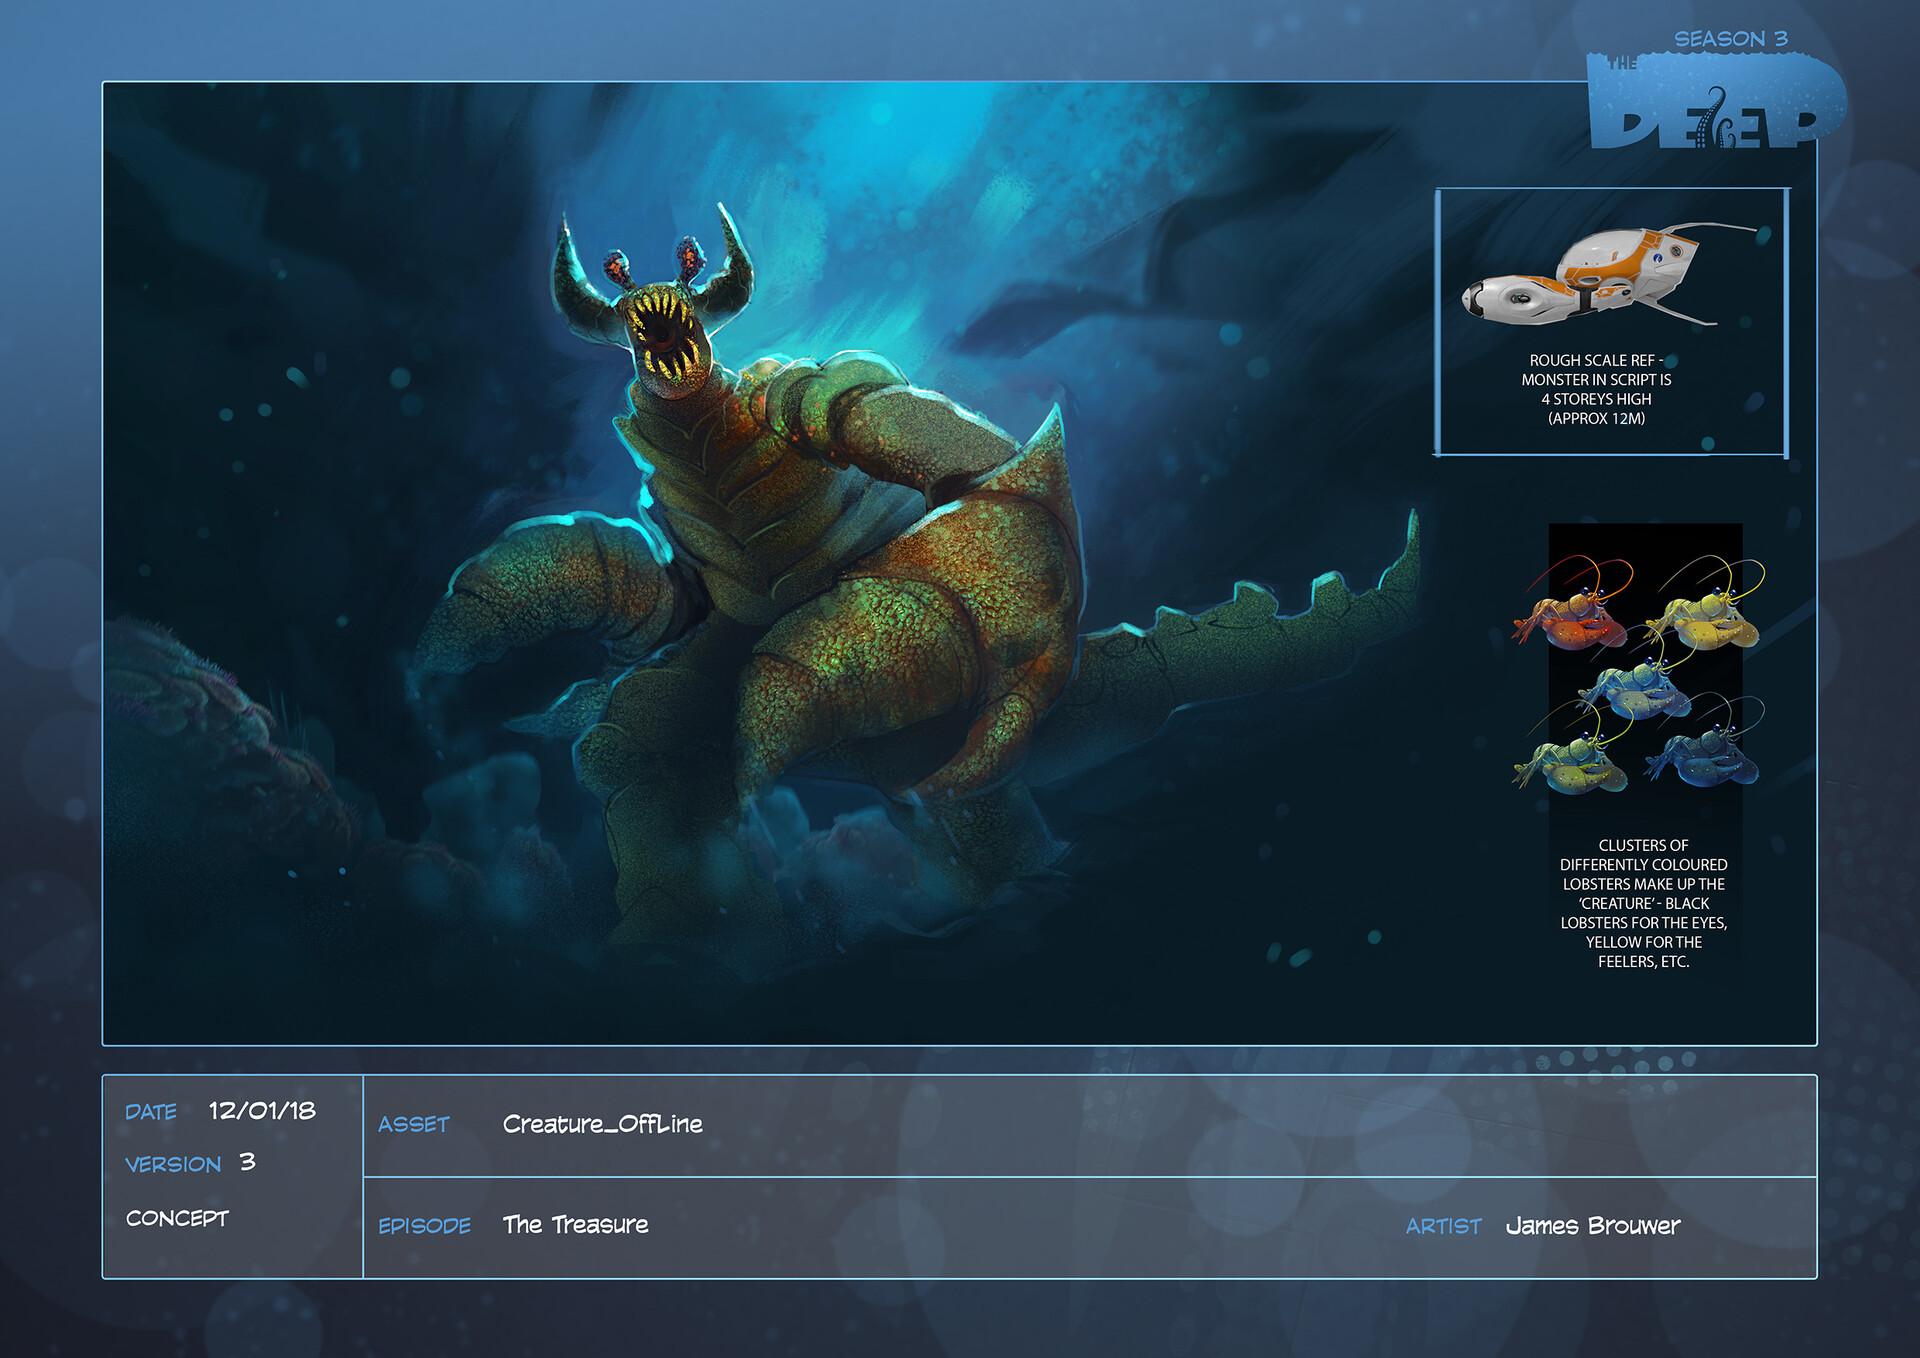 James brouwer creature offline design v003